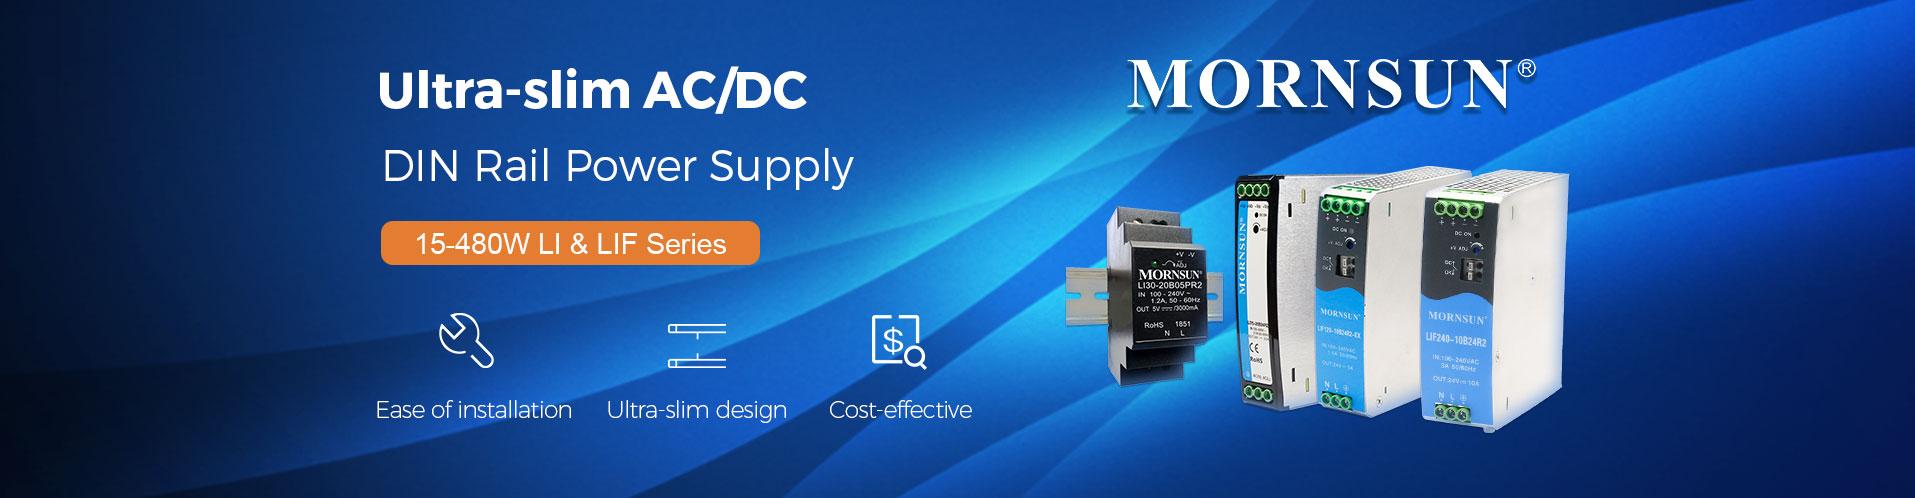 Ultra Slim AC/DC DIN-Rail Power Supply 30-480W LI & LIF Series